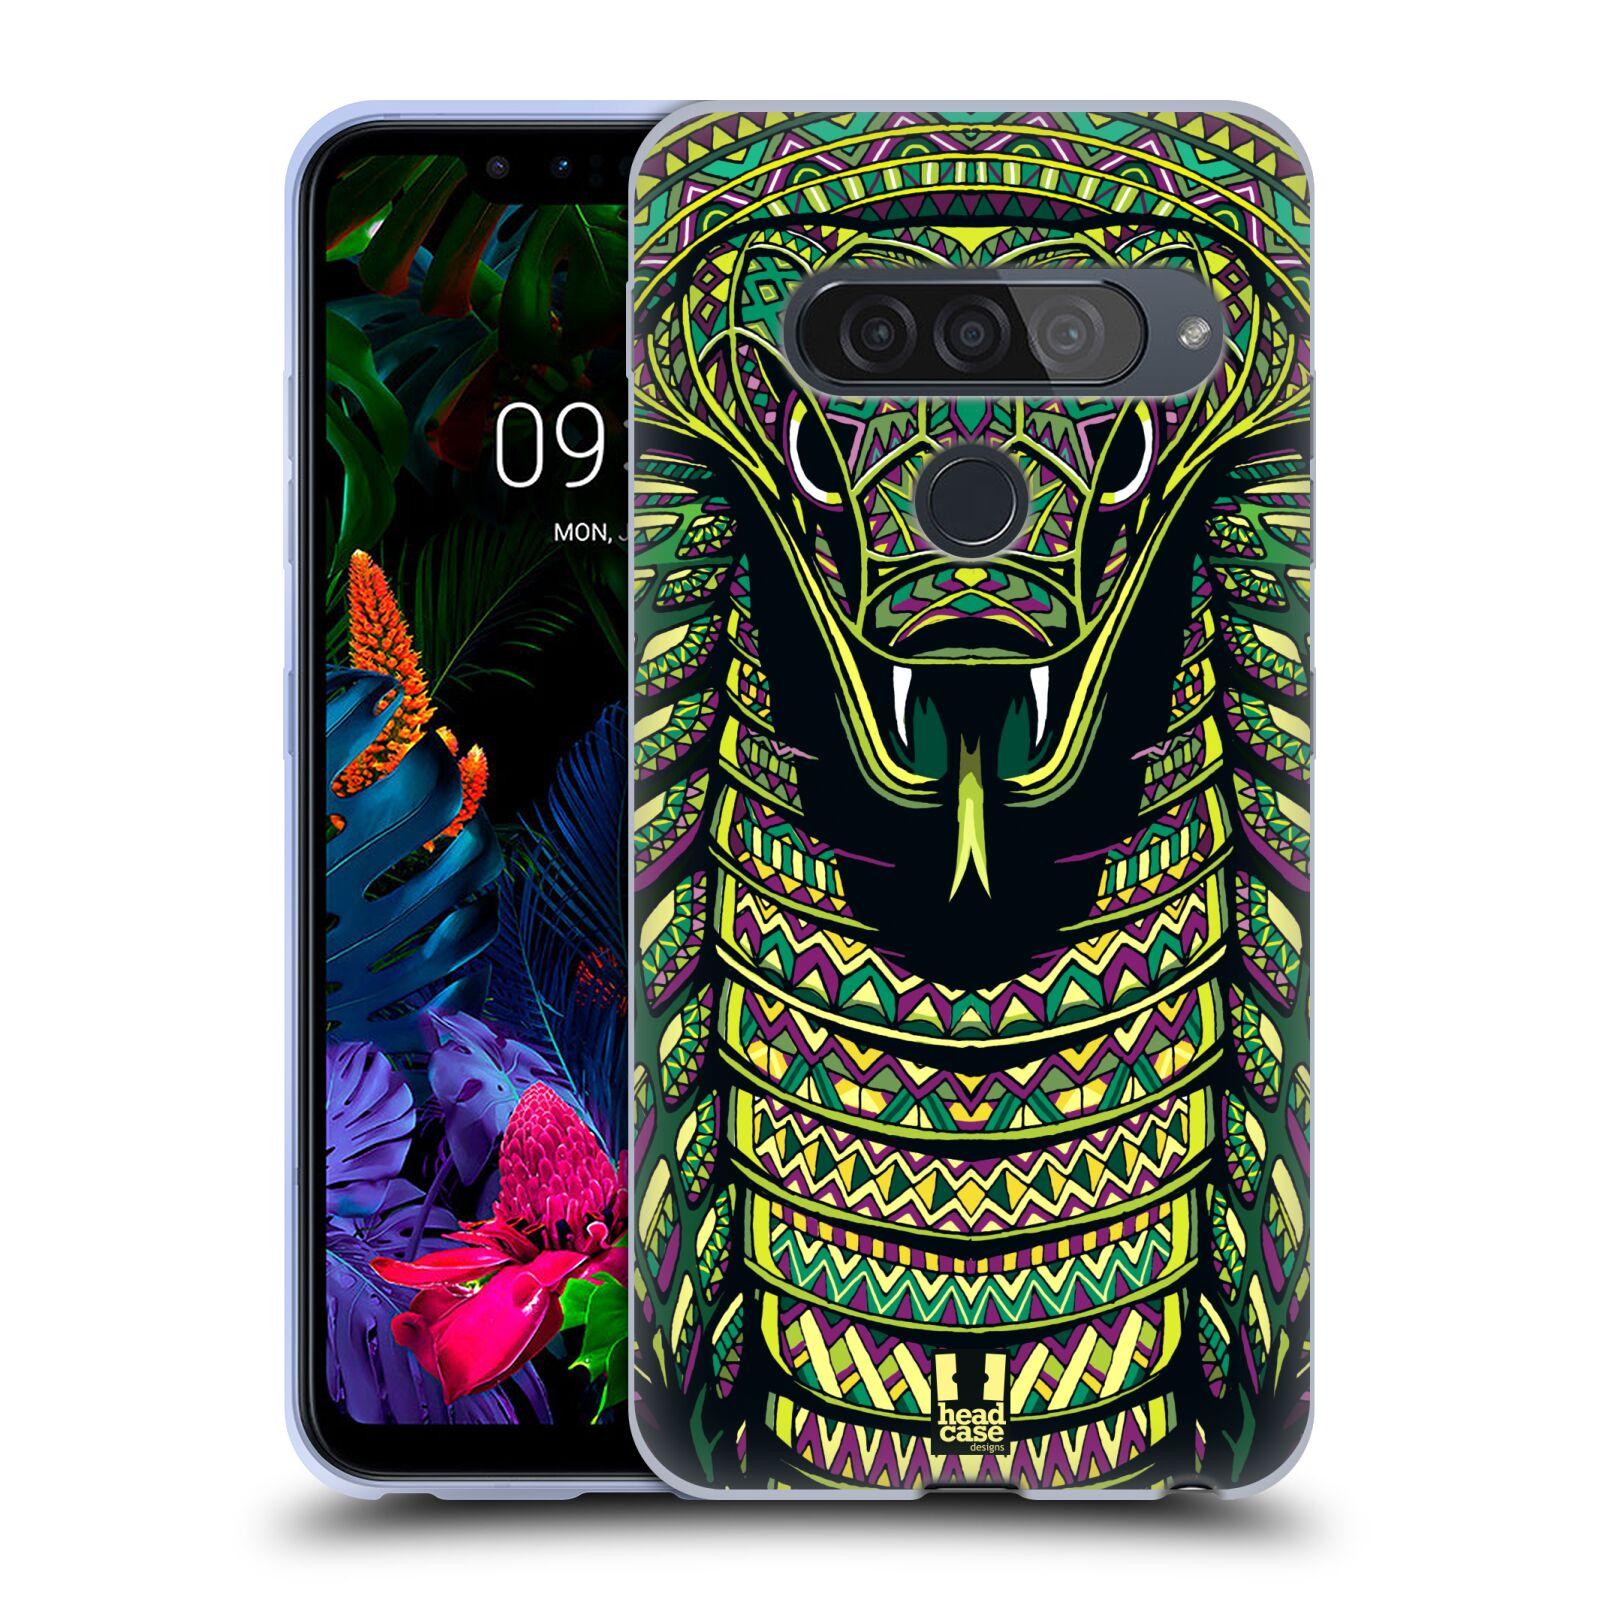 Silikonové pouzdro na mobil LG G8s ThinQ - Head Case - AZTEC HAD